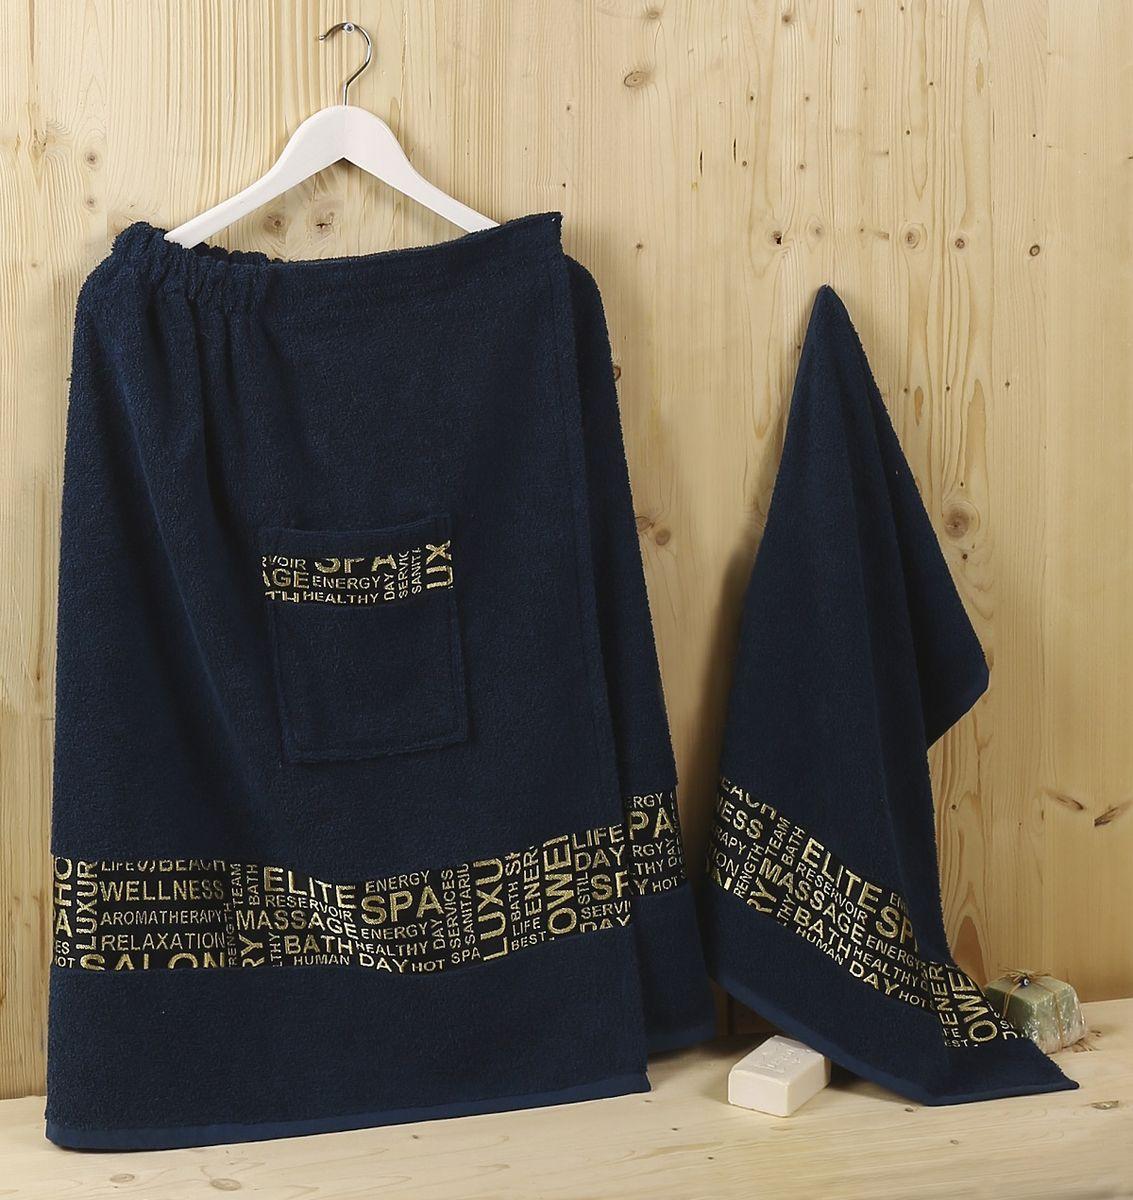 Набор для сауны Karna Relax, цвет: синий, 2 предмета1239/CHAR004